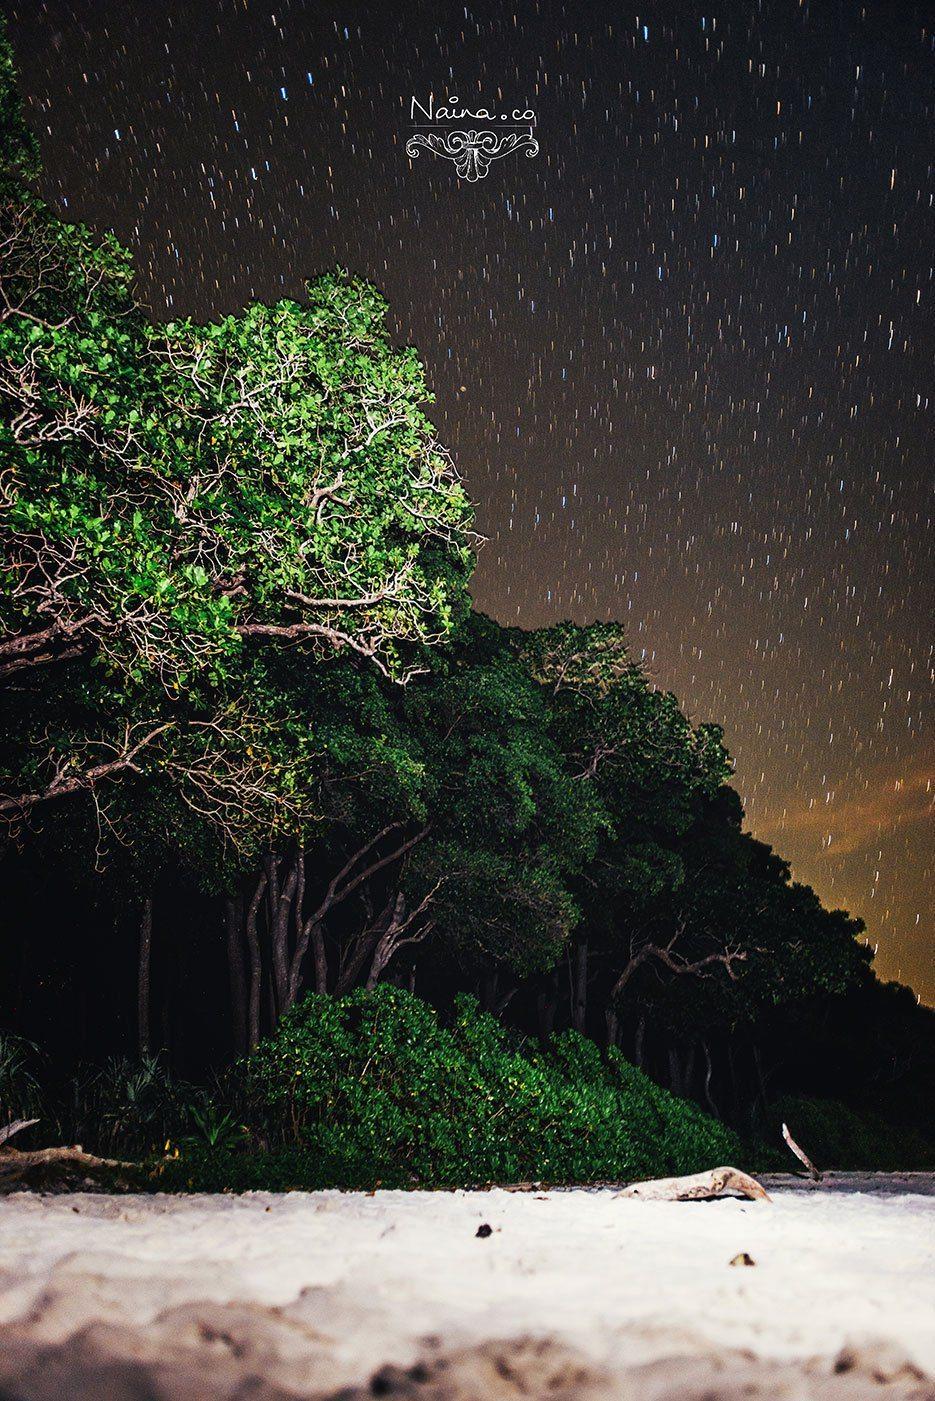 Andaman-Islands-Travel-Photography-Naina.co-Photographer-17